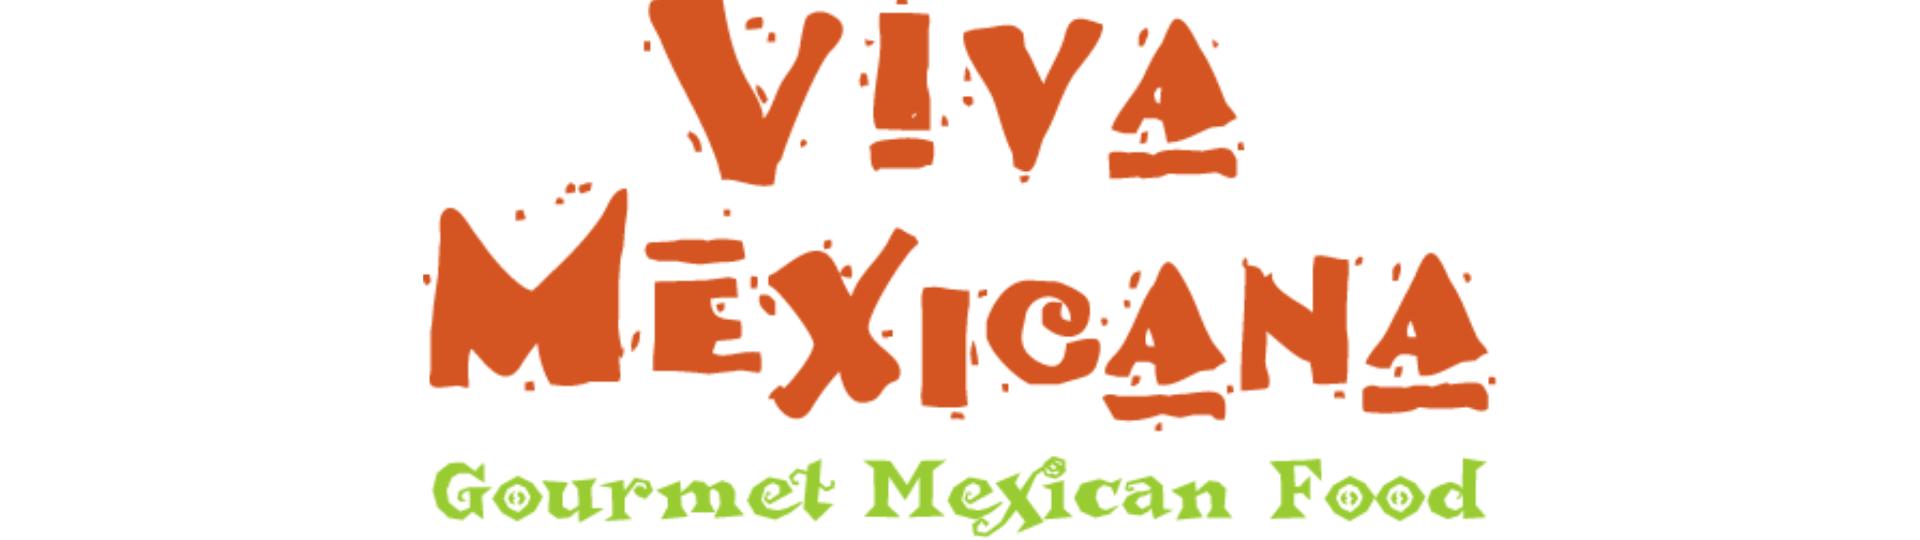 viva mexicana gourmet mexican food